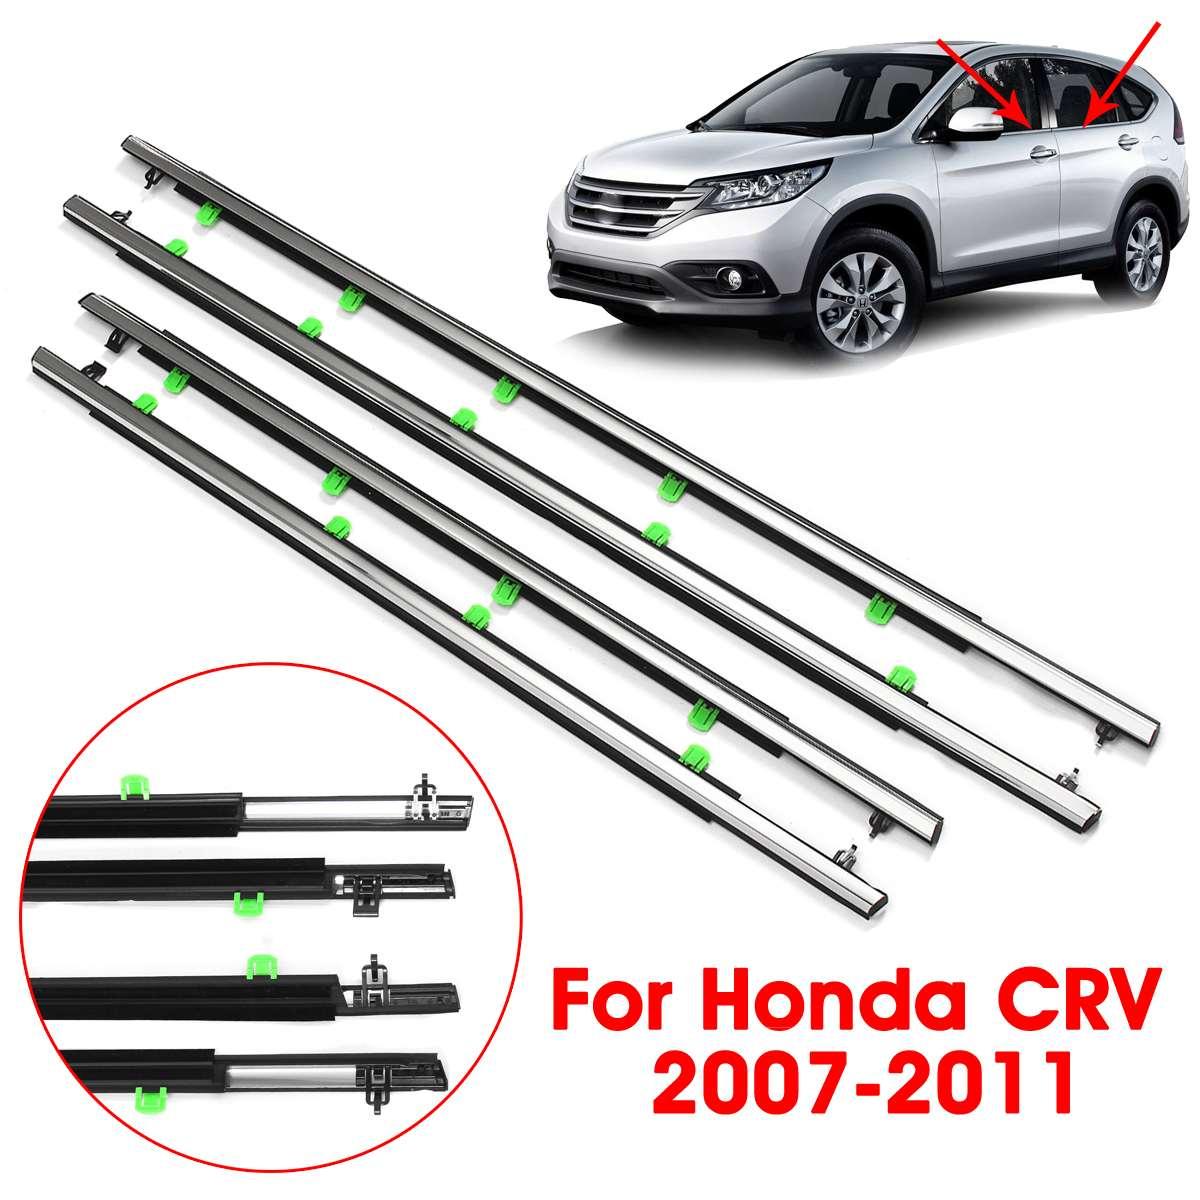 New 4pcs For Honda CRV CR-V 2007-2011 2008 2009 2010 Window Weatherstrip Seal Belt Car Outside Window Weather Stripping Moulding Trim